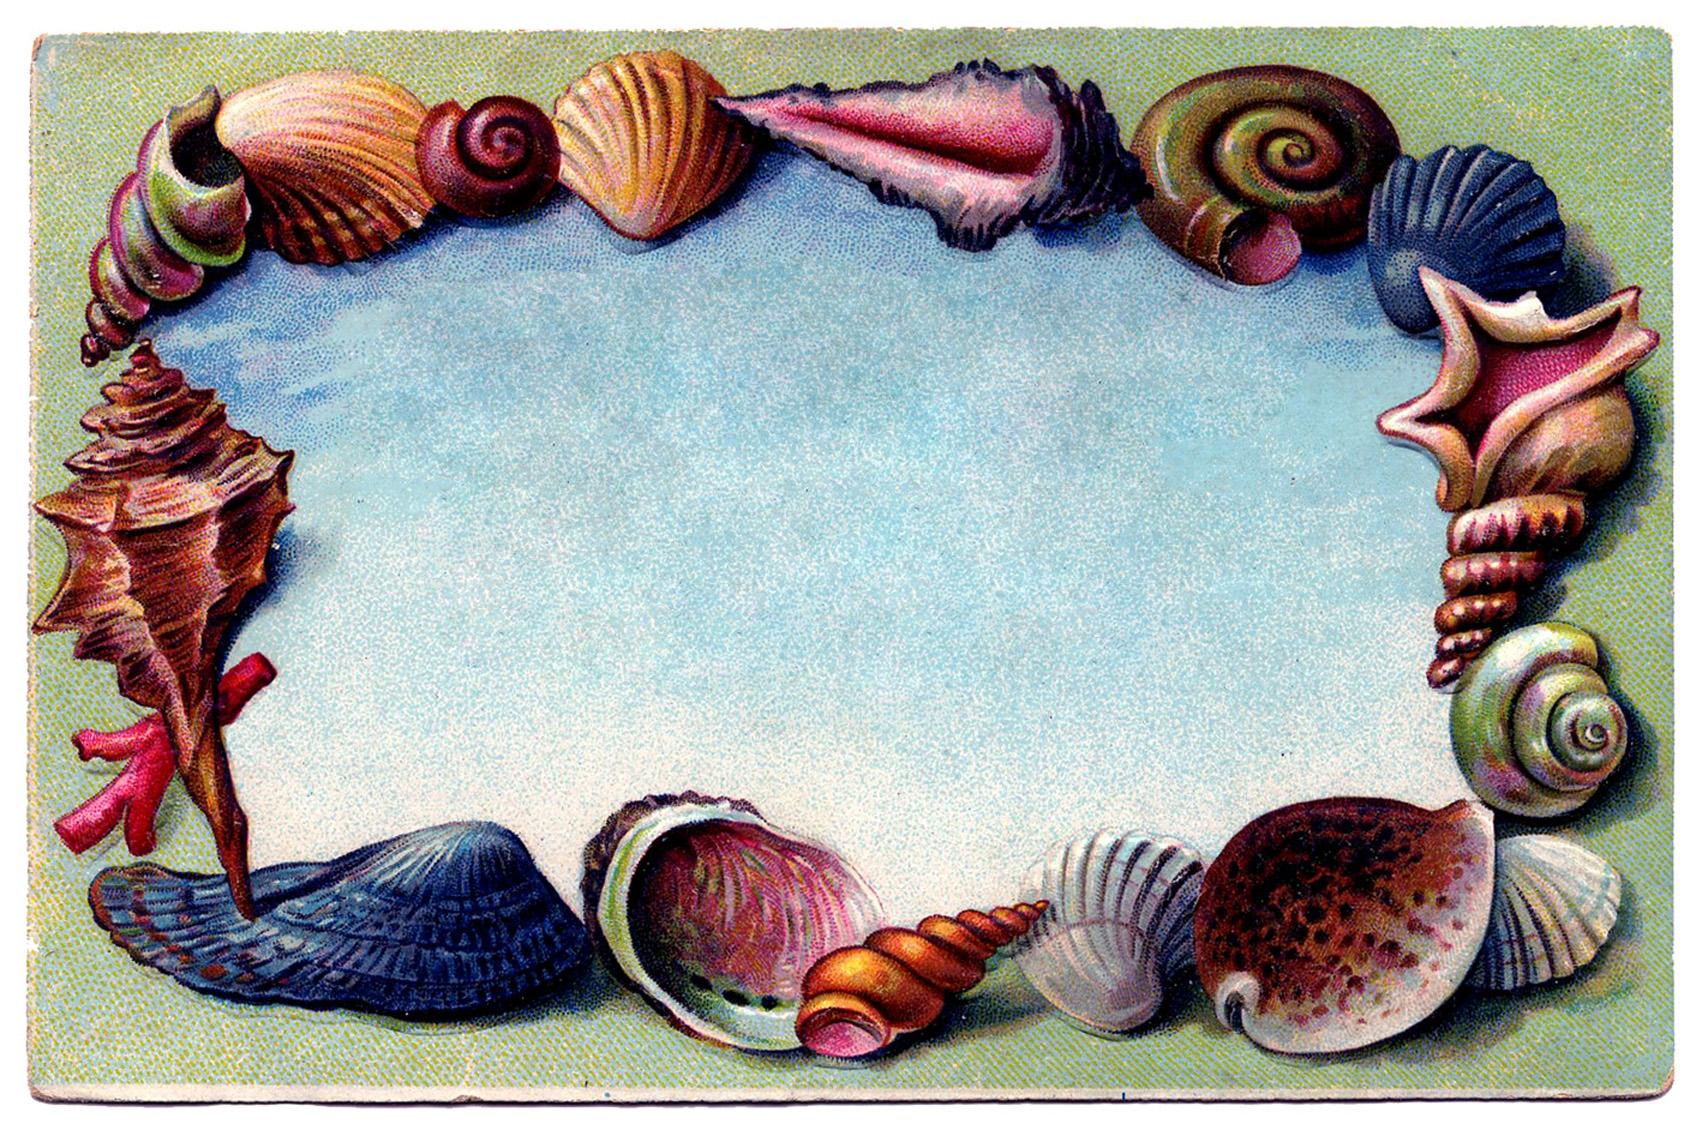 7 Souvenir Seashell Clipart! - The Graphics Fairy